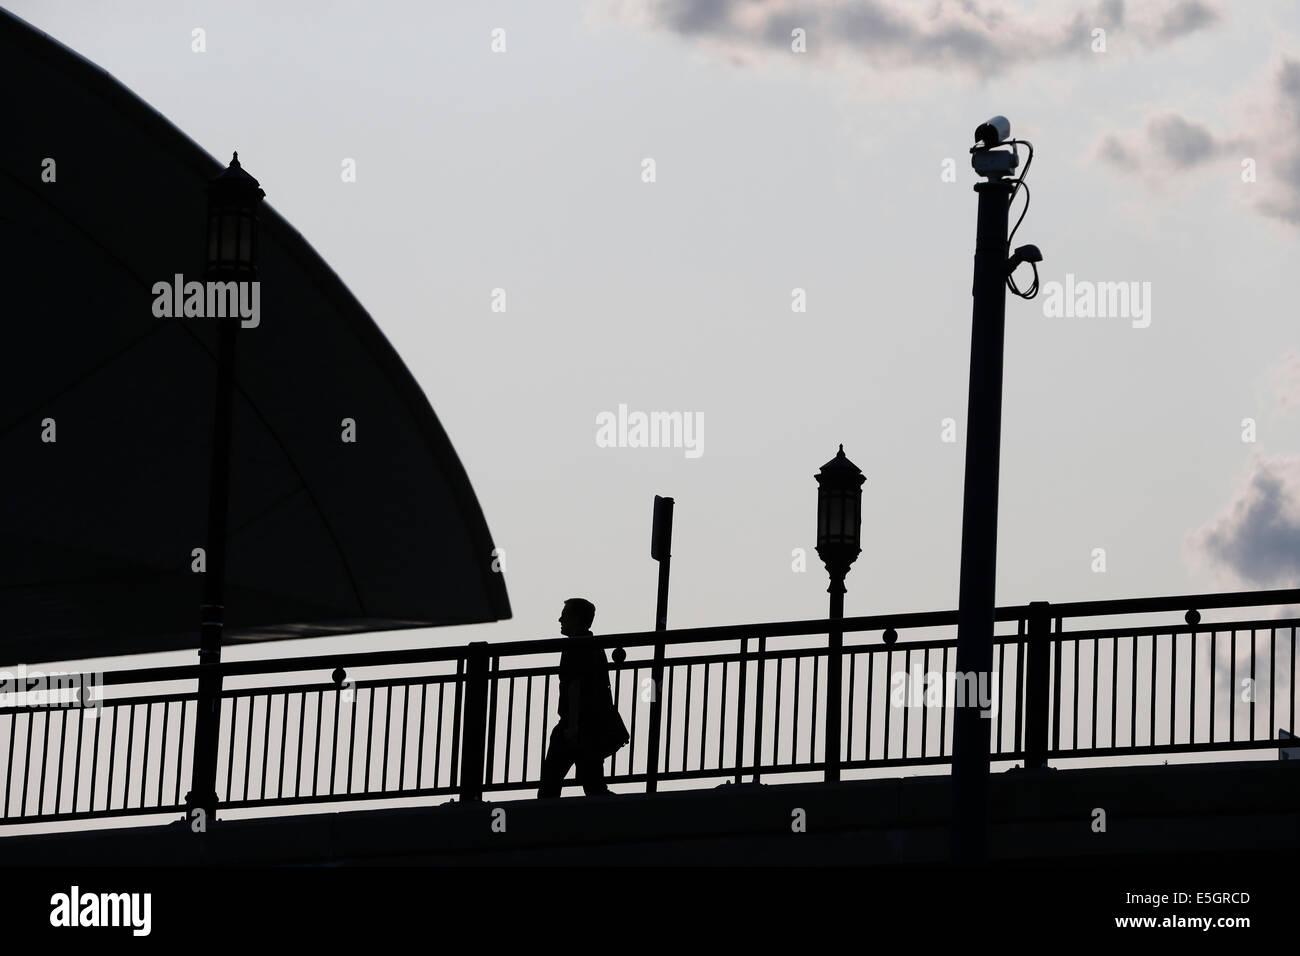 A pedestrian in silhouette walks under a pole mounted surveillance camera. Boston, Massachusetts, USA - Stock Image